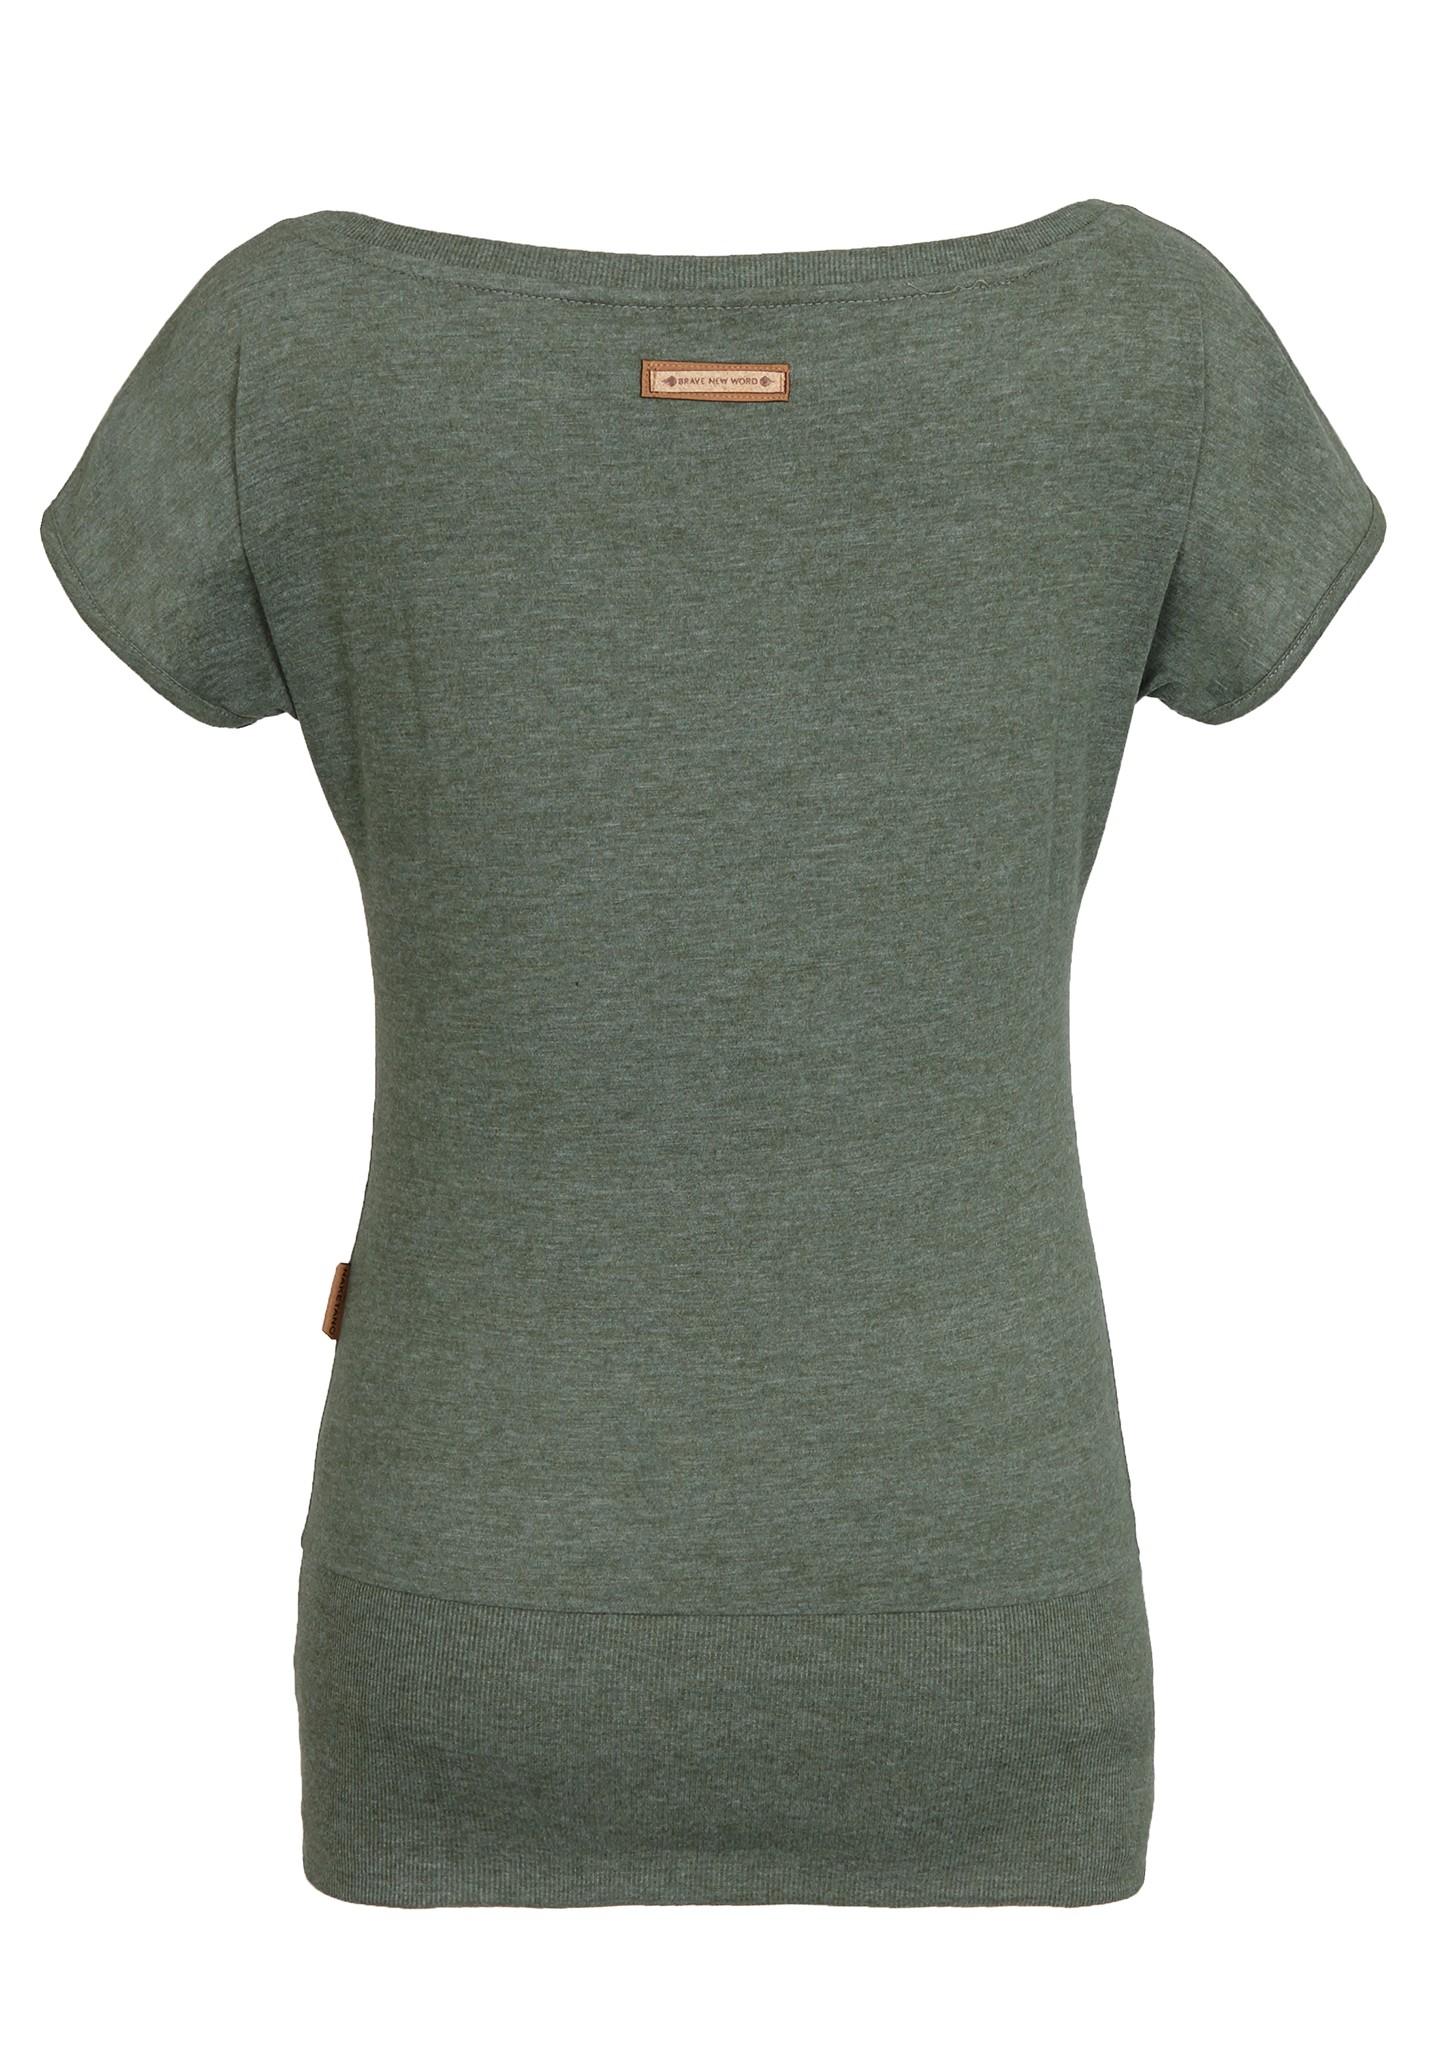 neu naketano wolle v damen t shirt shirt ebay. Black Bedroom Furniture Sets. Home Design Ideas